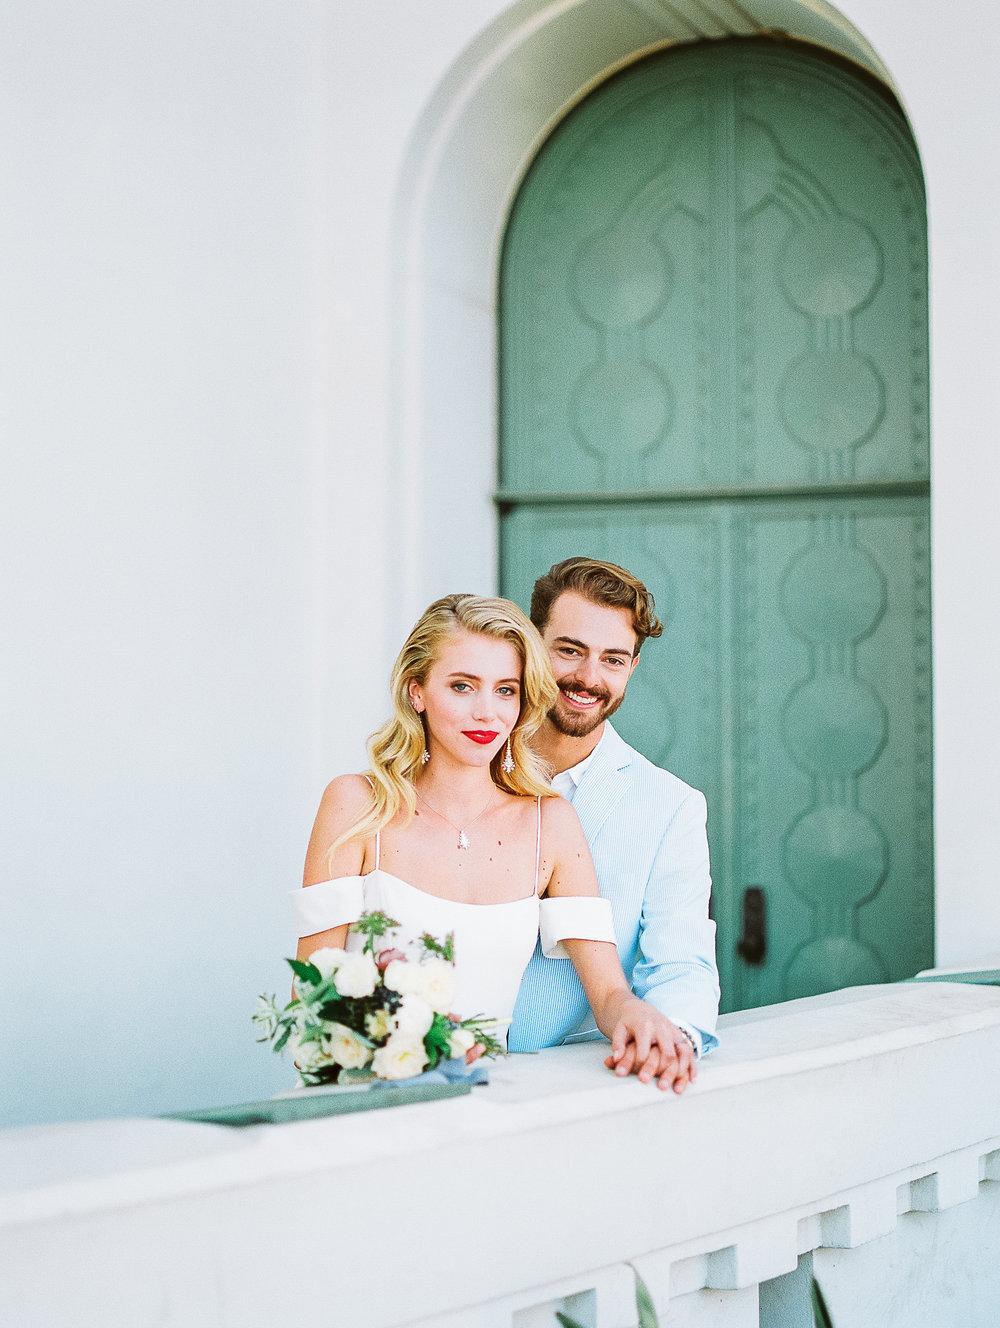 LA-Wedding-Shoot-by-JBJ-Pictures-307.jpg